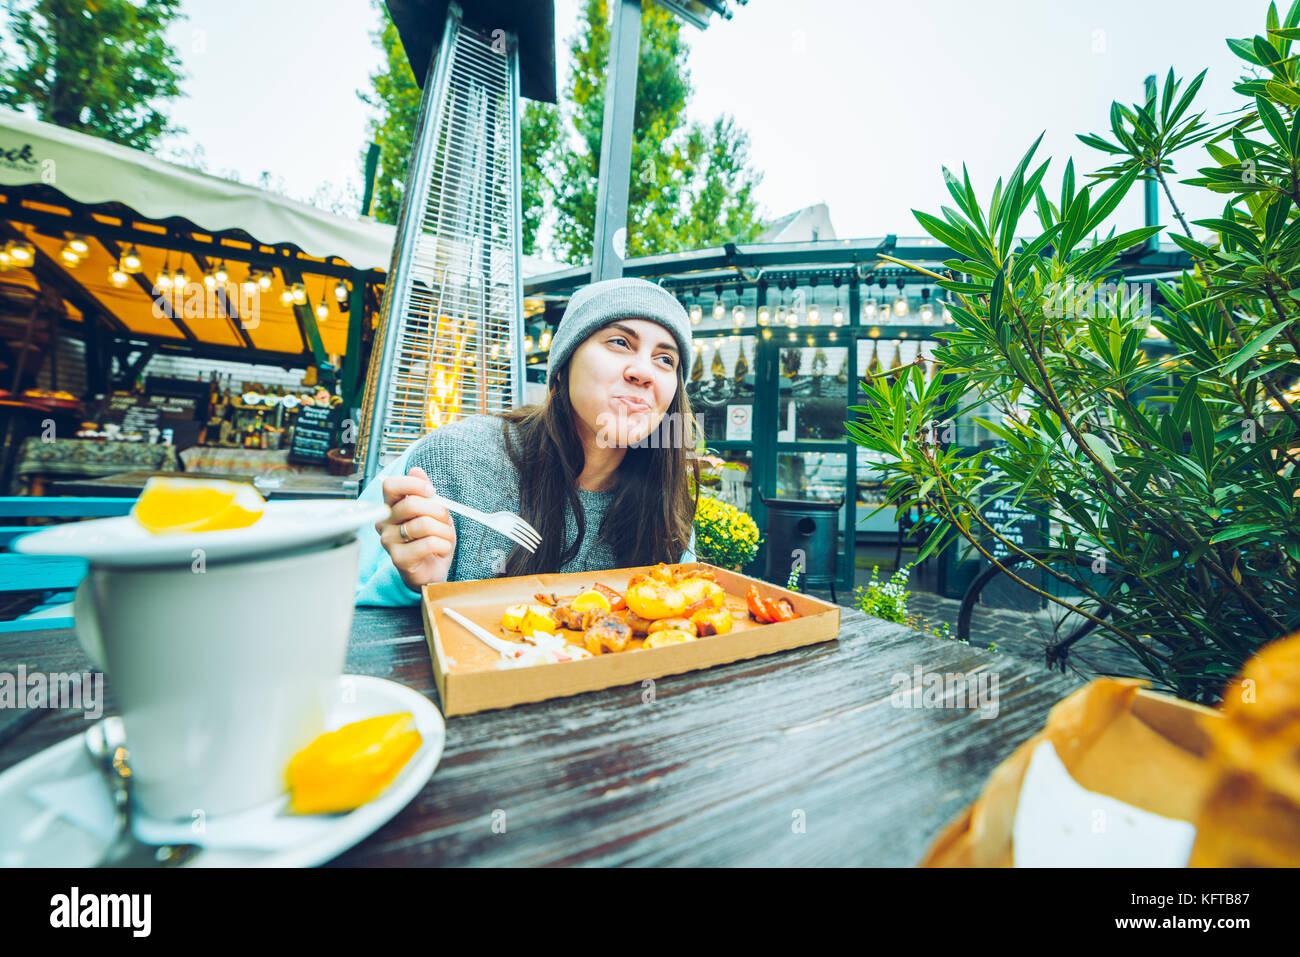 Schöne Frau Essen in outside cafe Stockbild